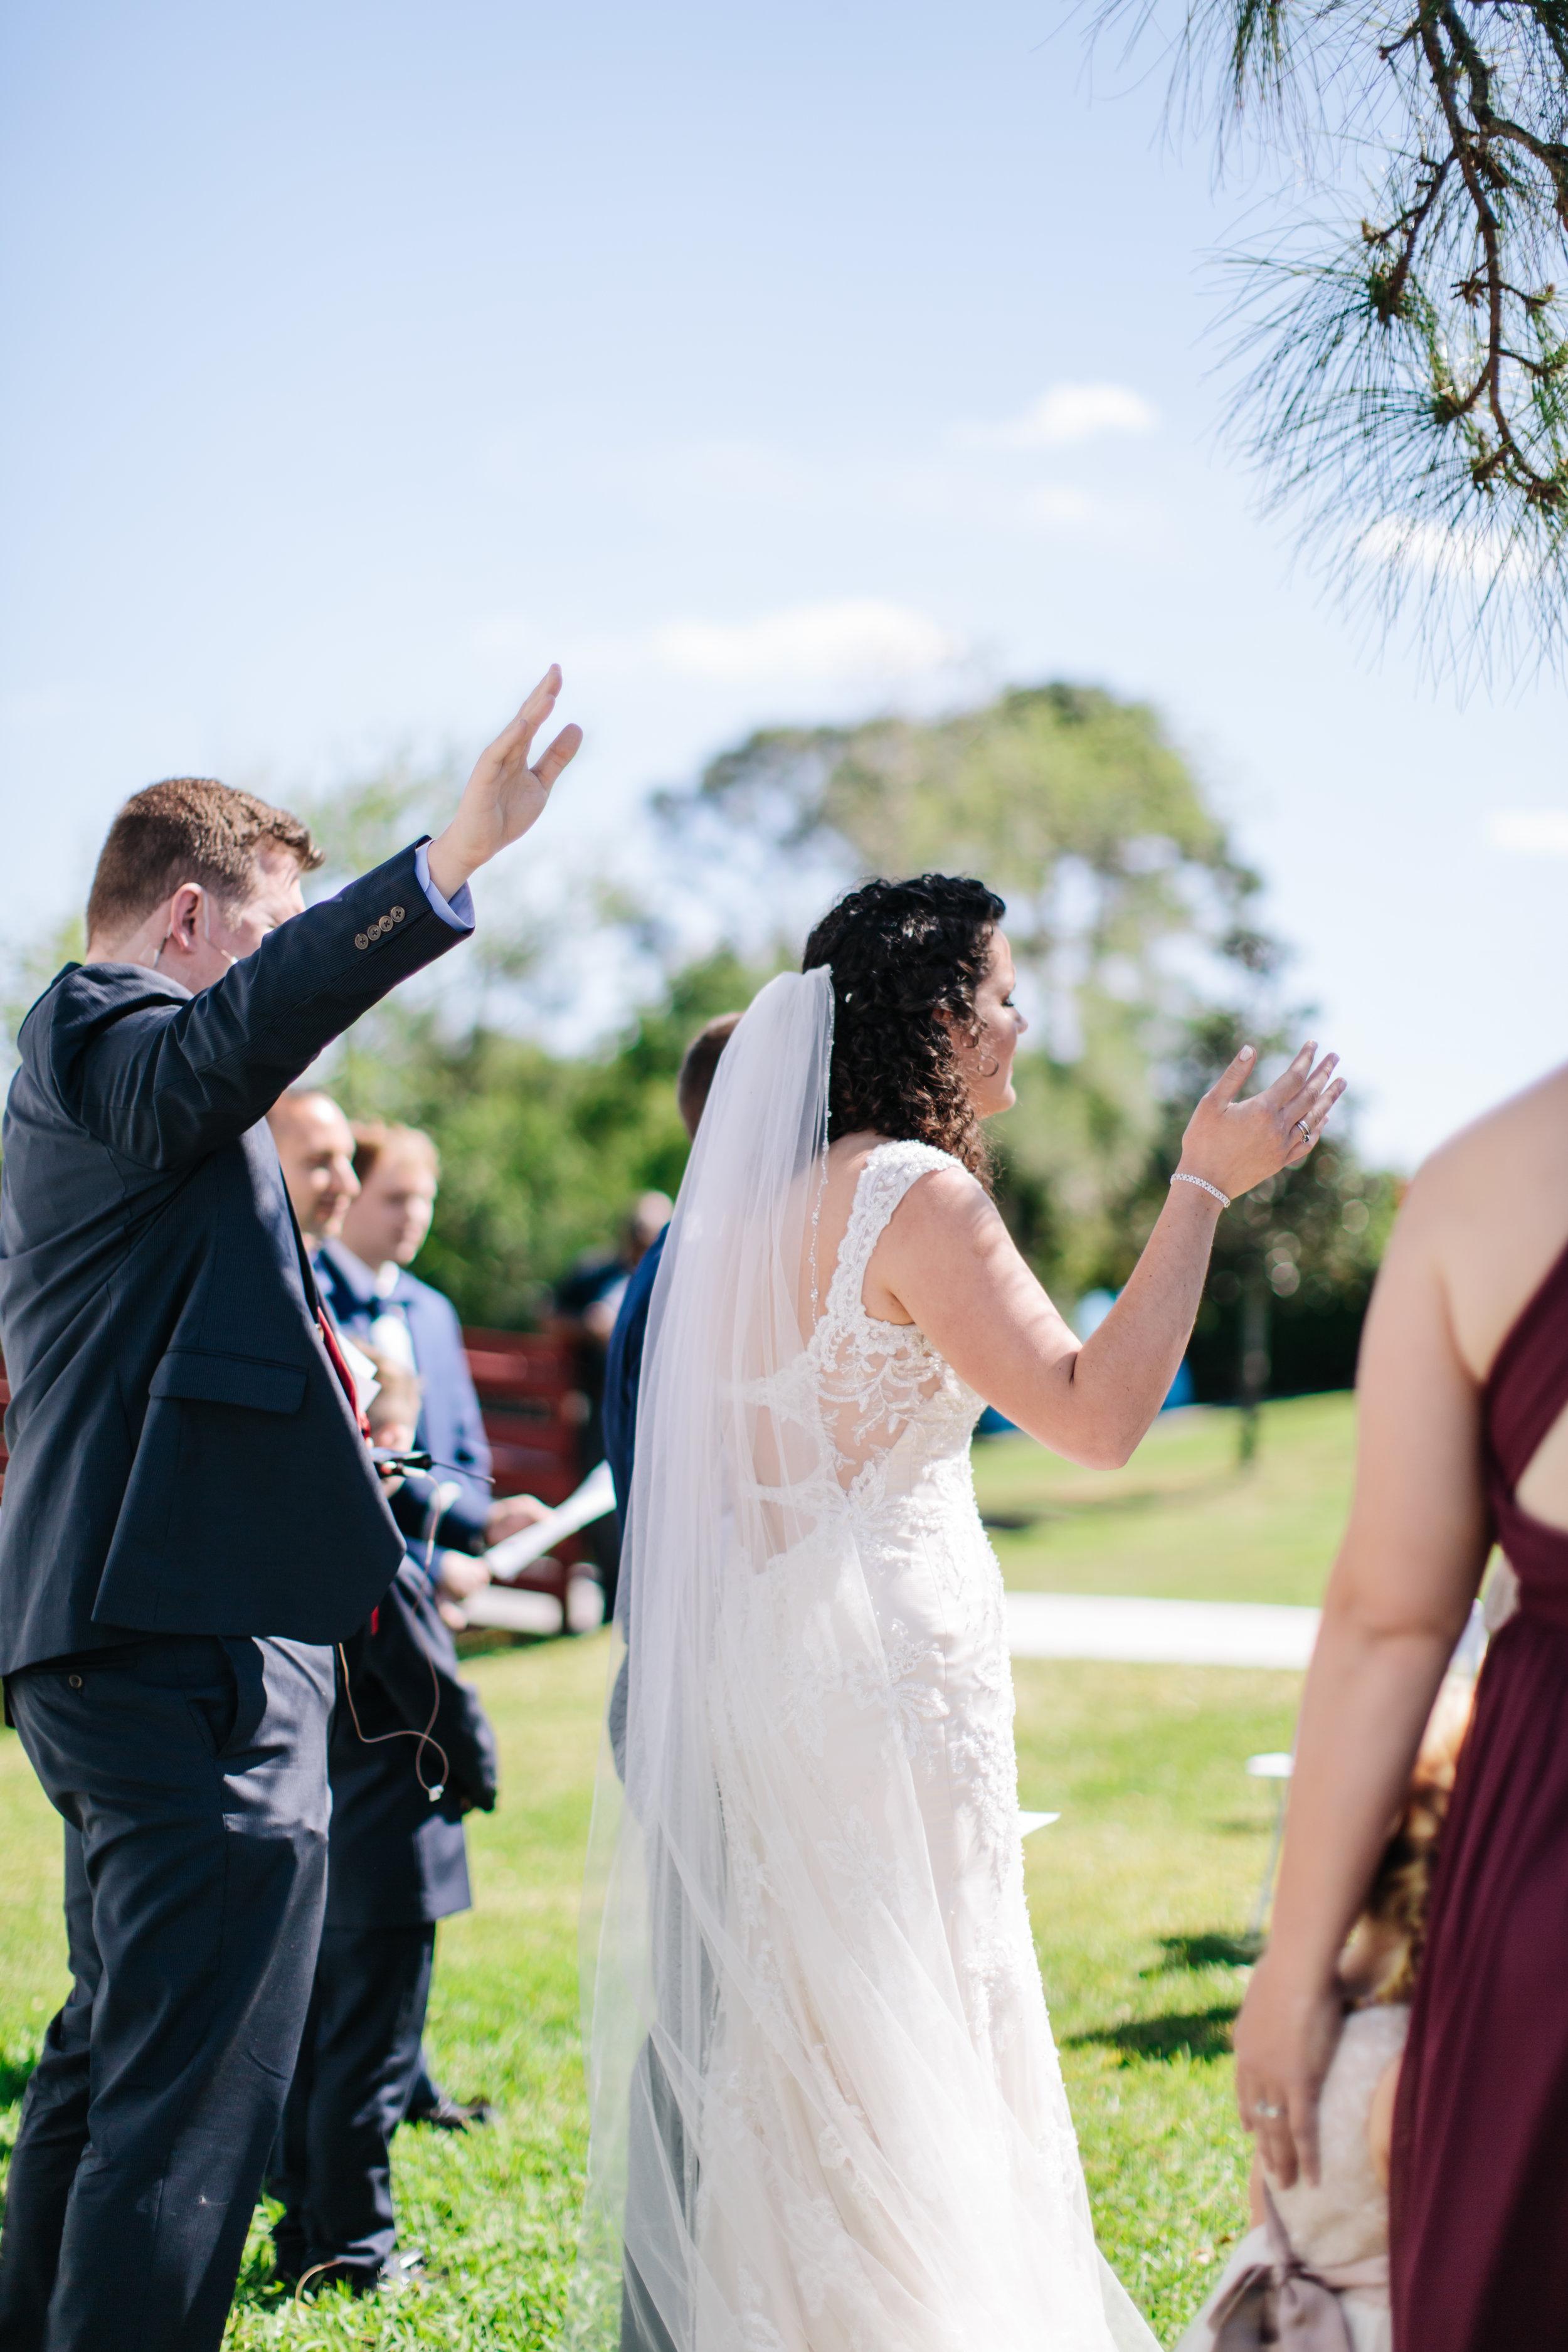 2018.03.17 Allison and Chuck Wedding Waelti Melbourne (278 of 900).jpg